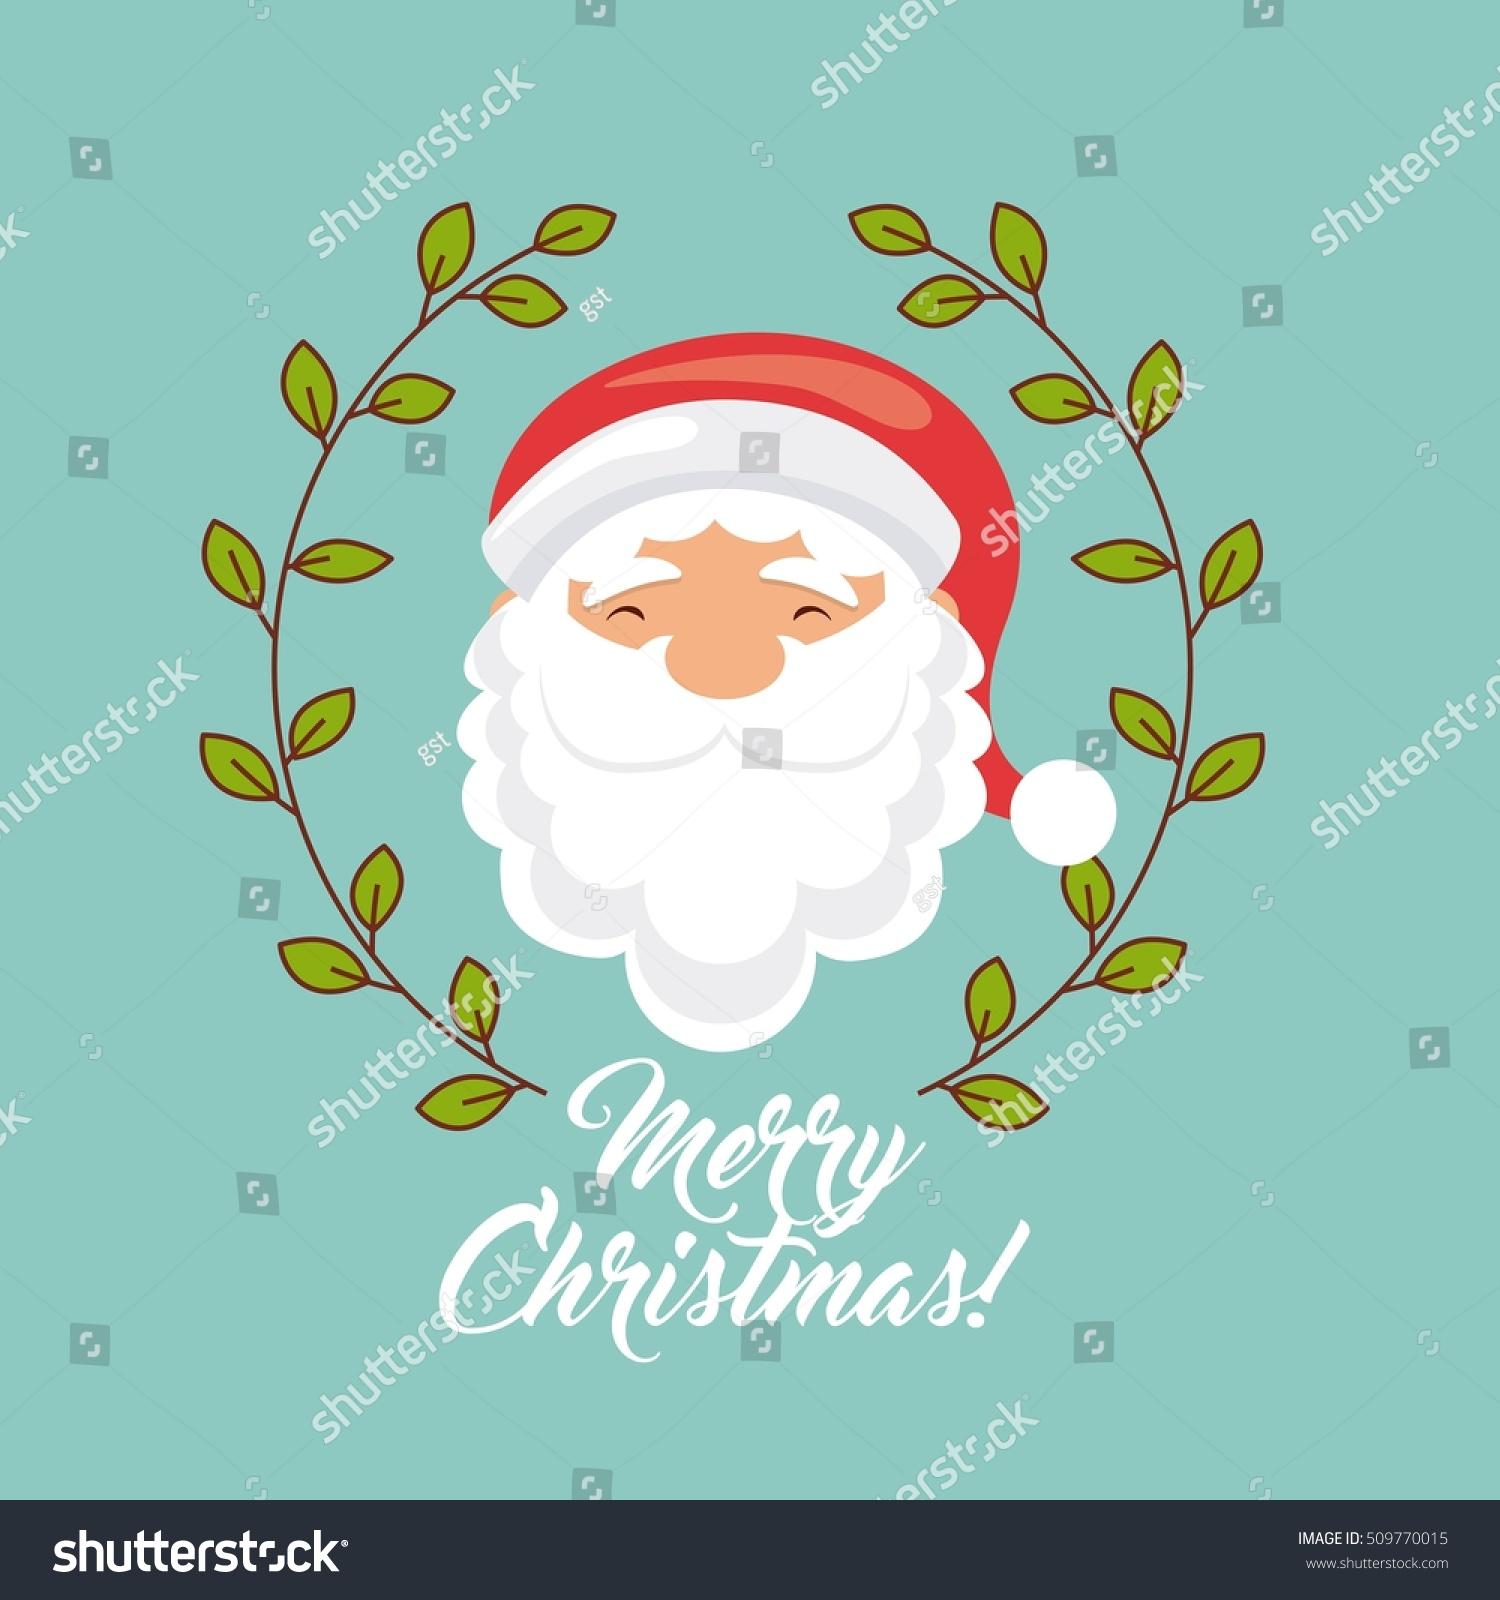 Happy Merry Christmas Card Vector Illustration Design